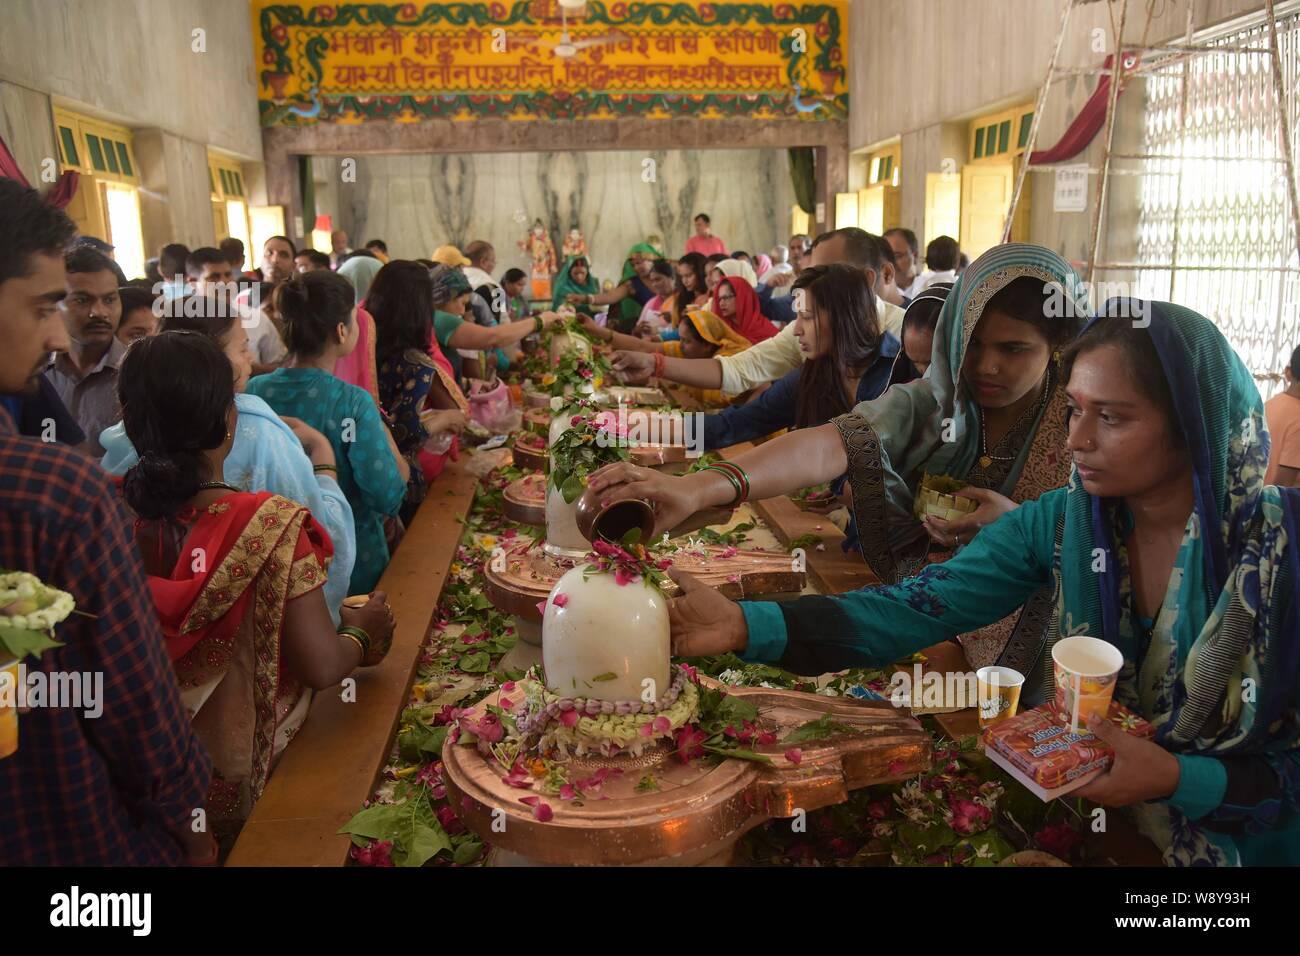 August 12, 2019: Prayagraj: Hindu Devotee offer prayer to